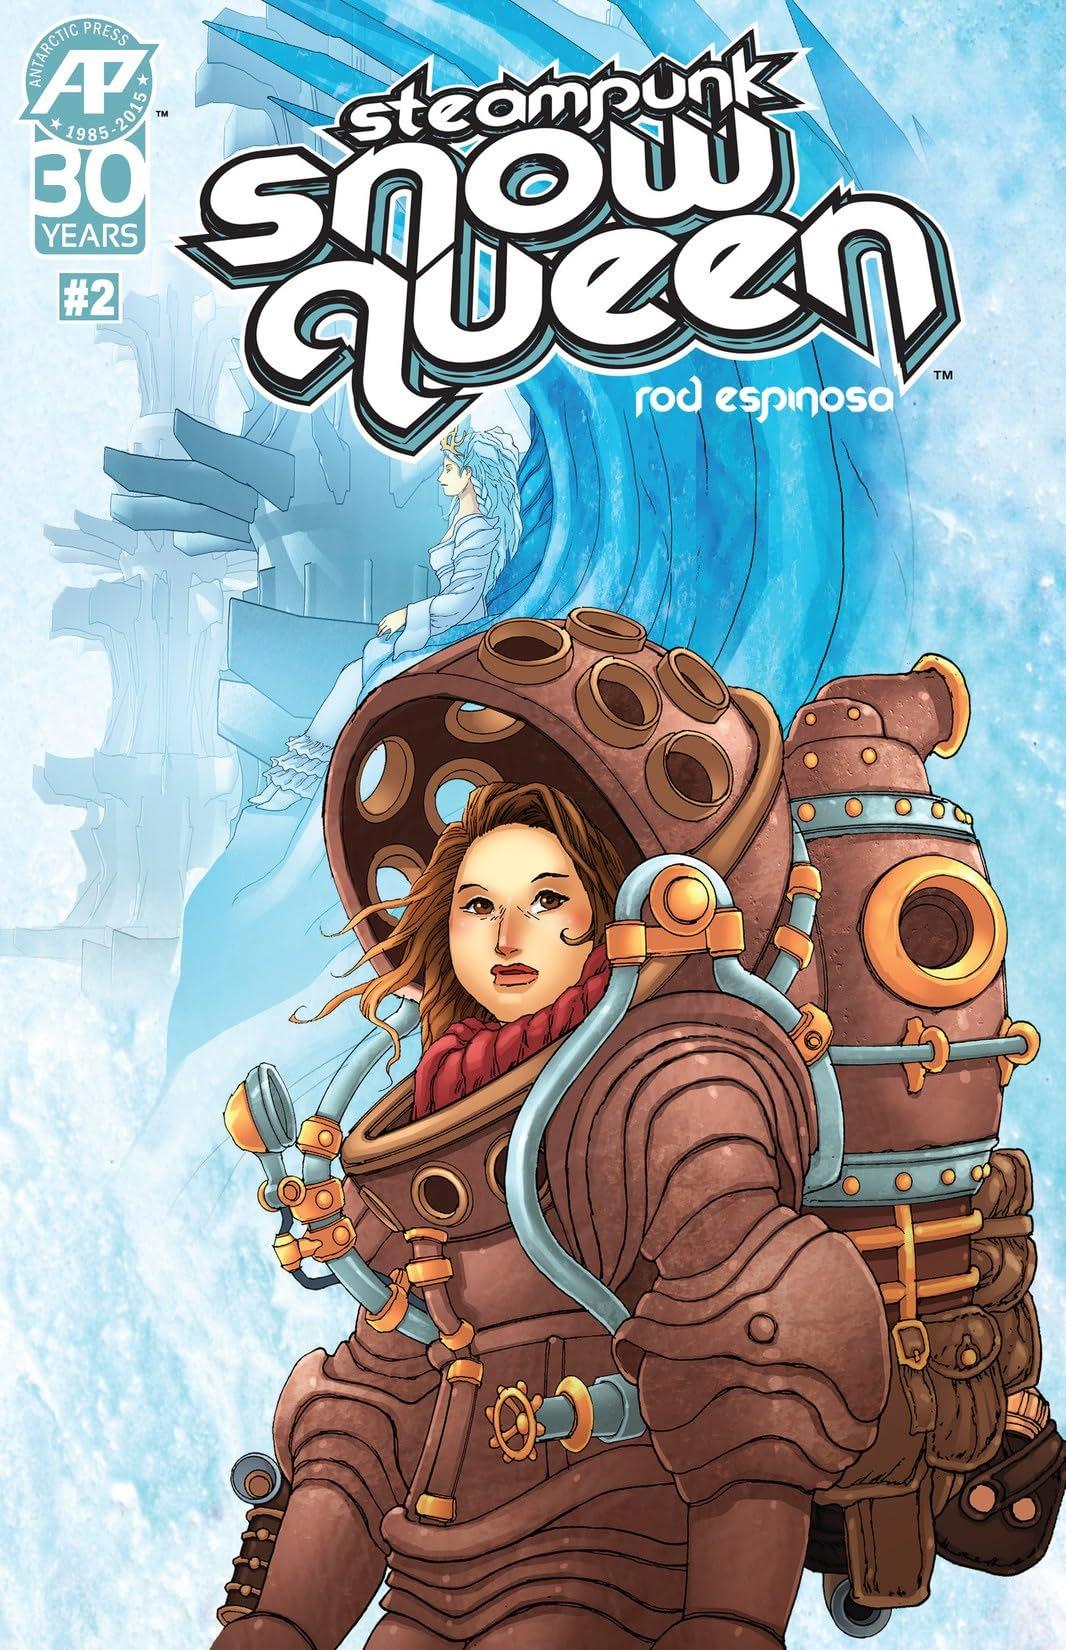 Rod Espinosa's Steampunk Snow Queen #2 (of 3)